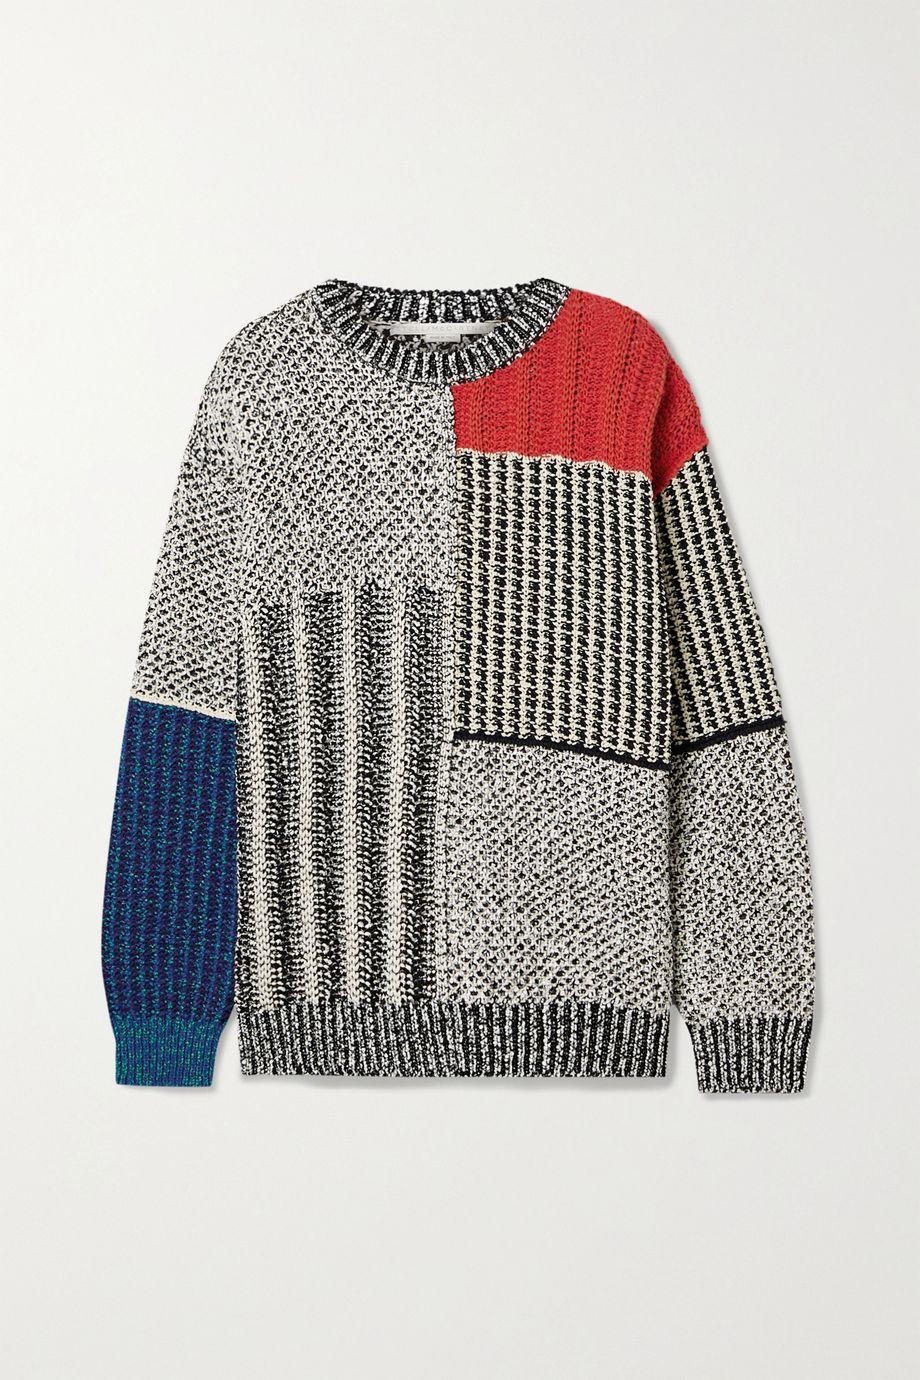 Stella McCartney Patchwork oversized knitted sweater